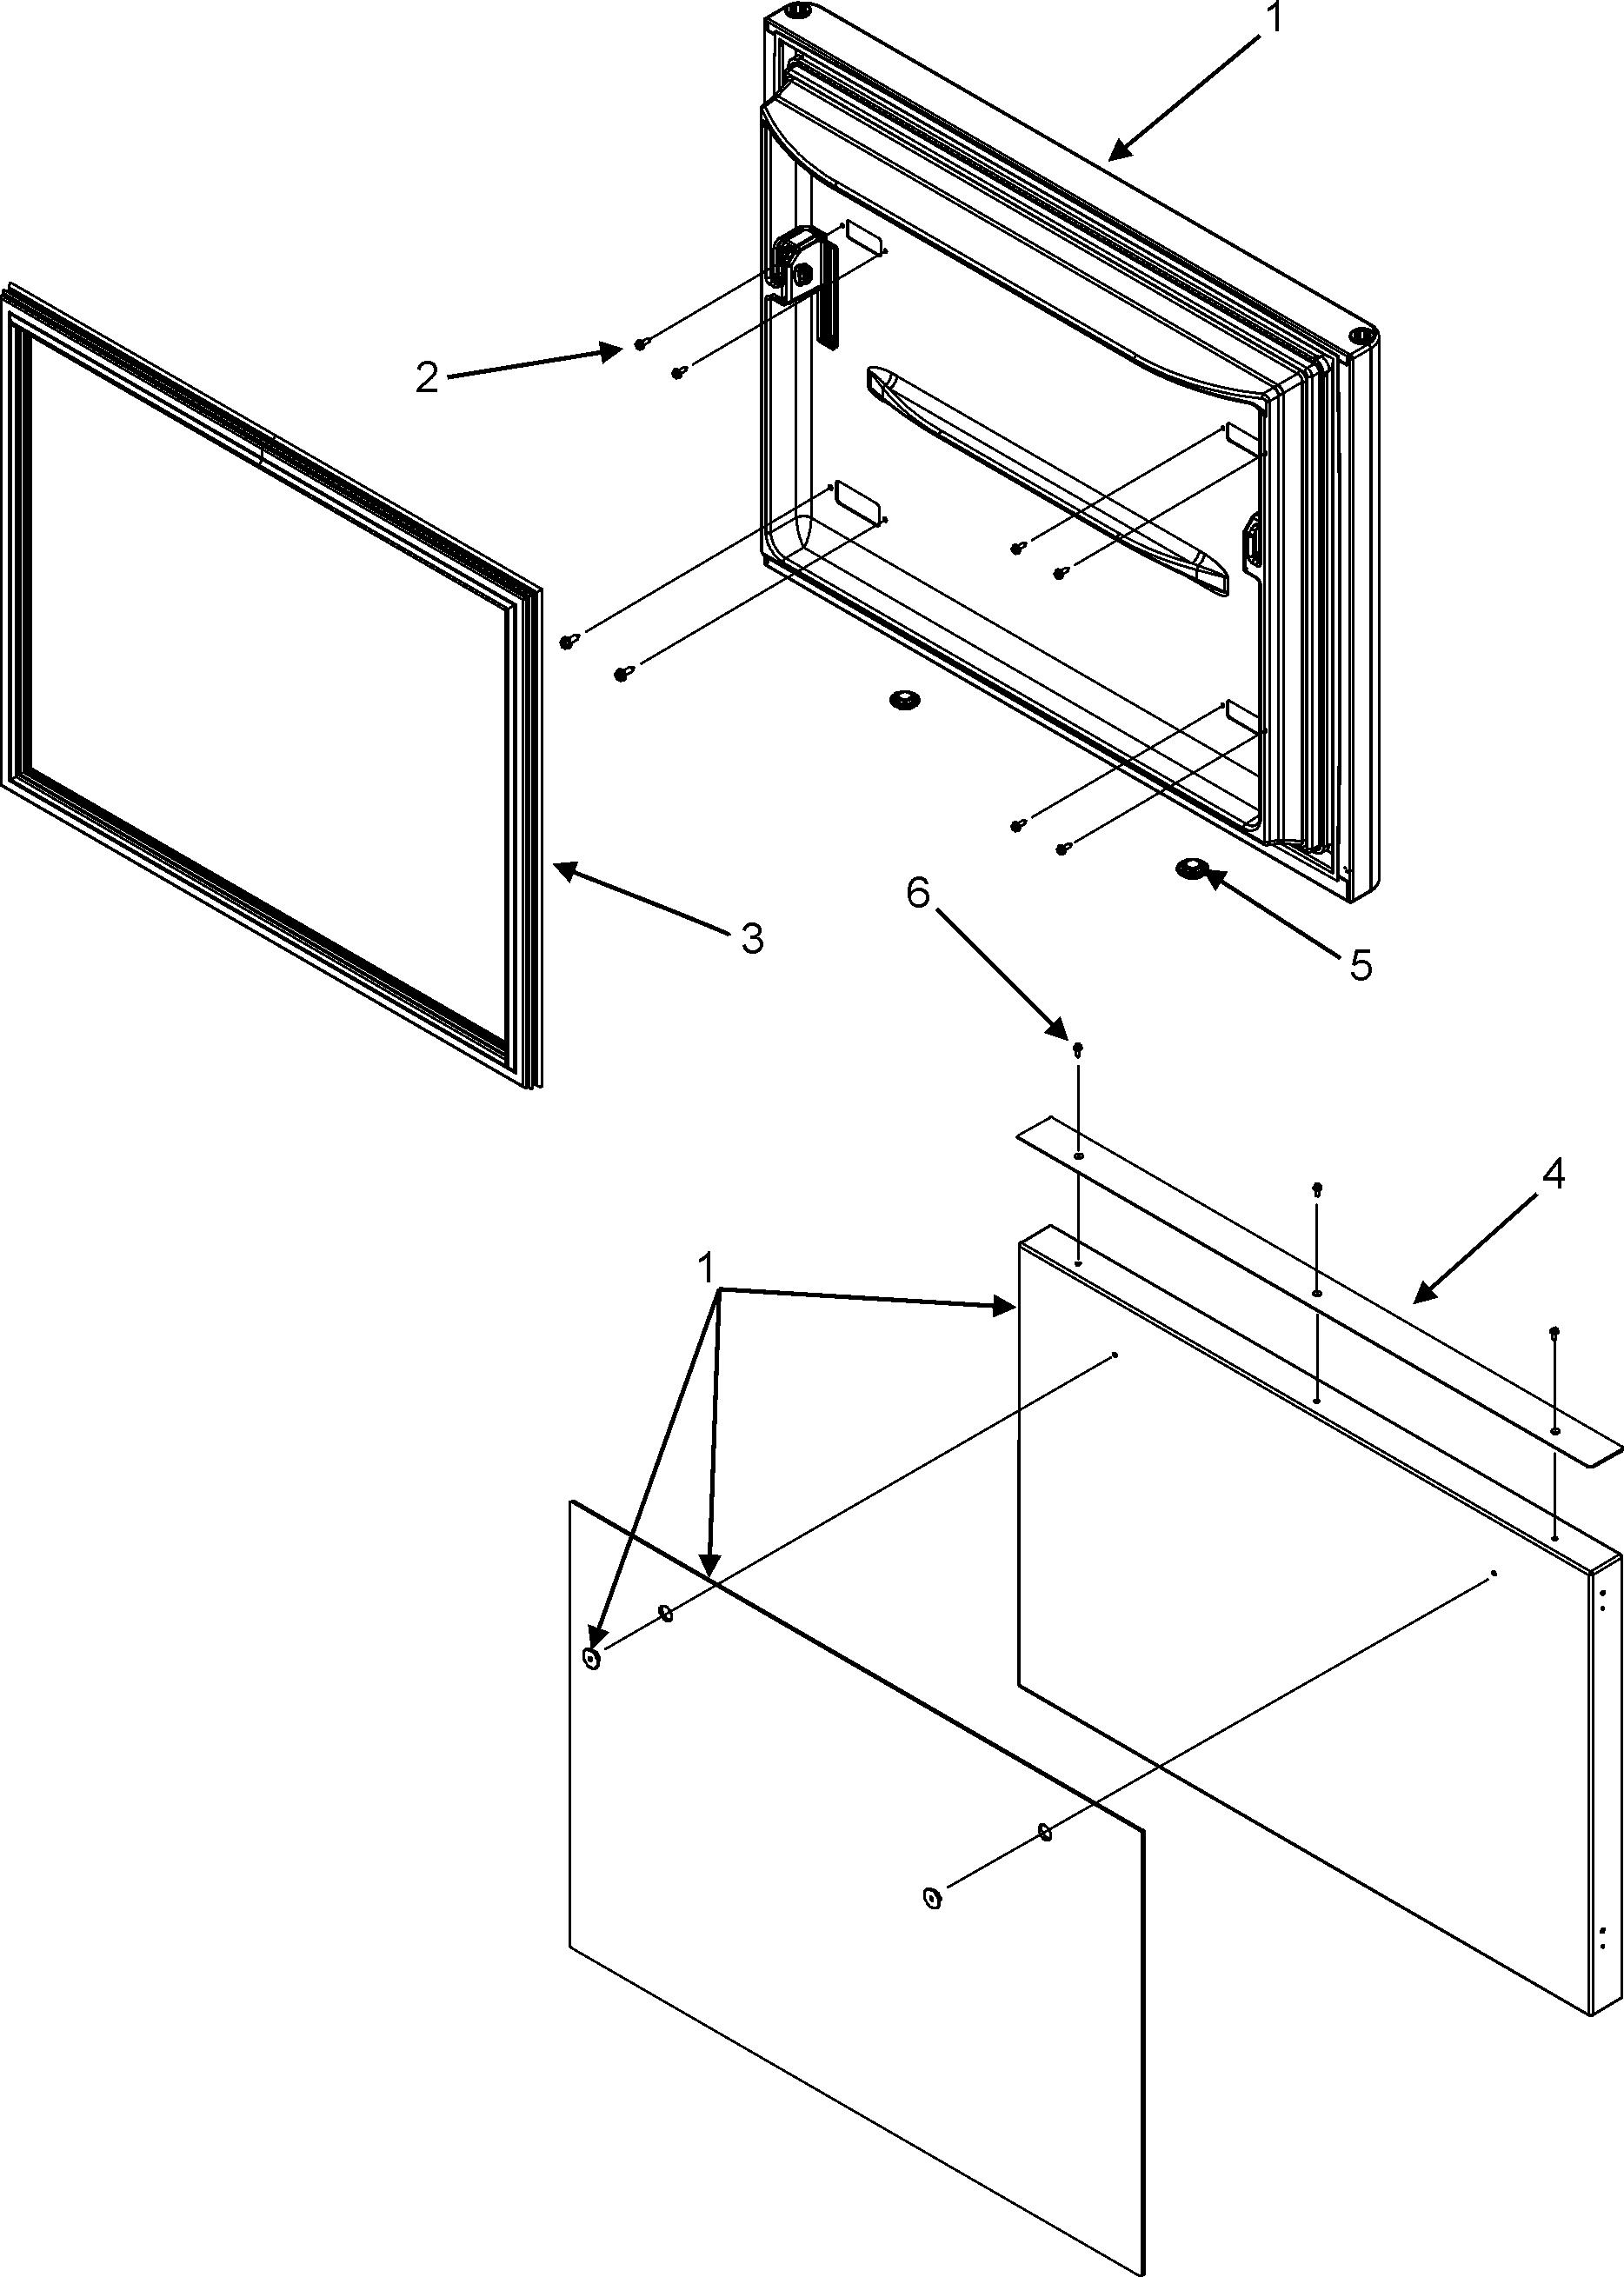 jenn air refrigerator parts diagram wiring for chinese 50cc atv freezer door and list model jfc2089hpy